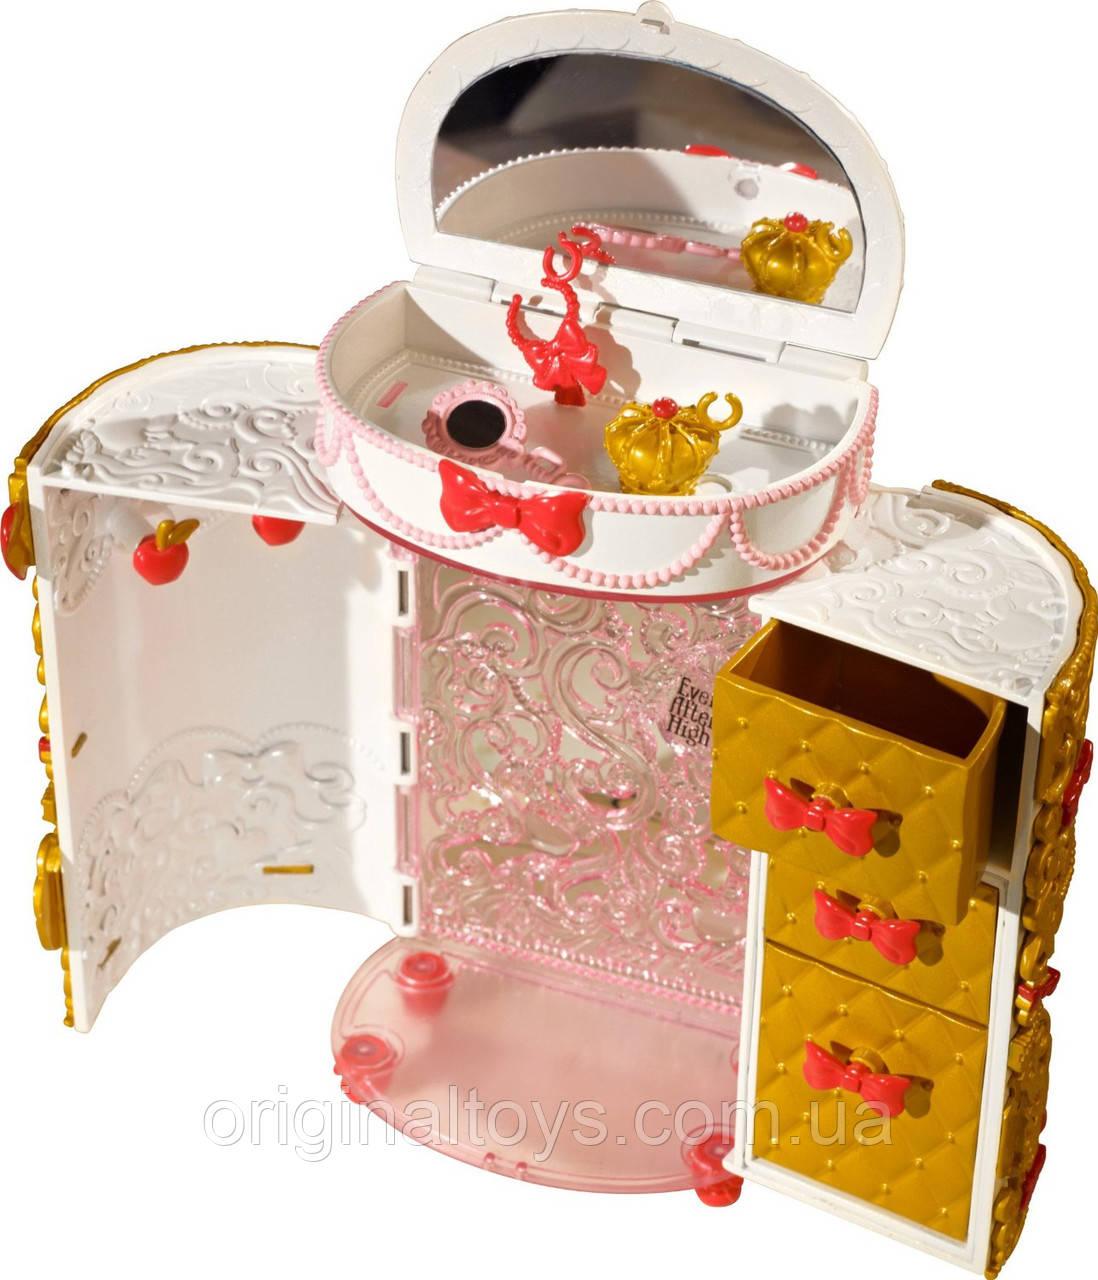 Шкатулка Эппл Вайт Apple White's Jewelry Box Ever After High